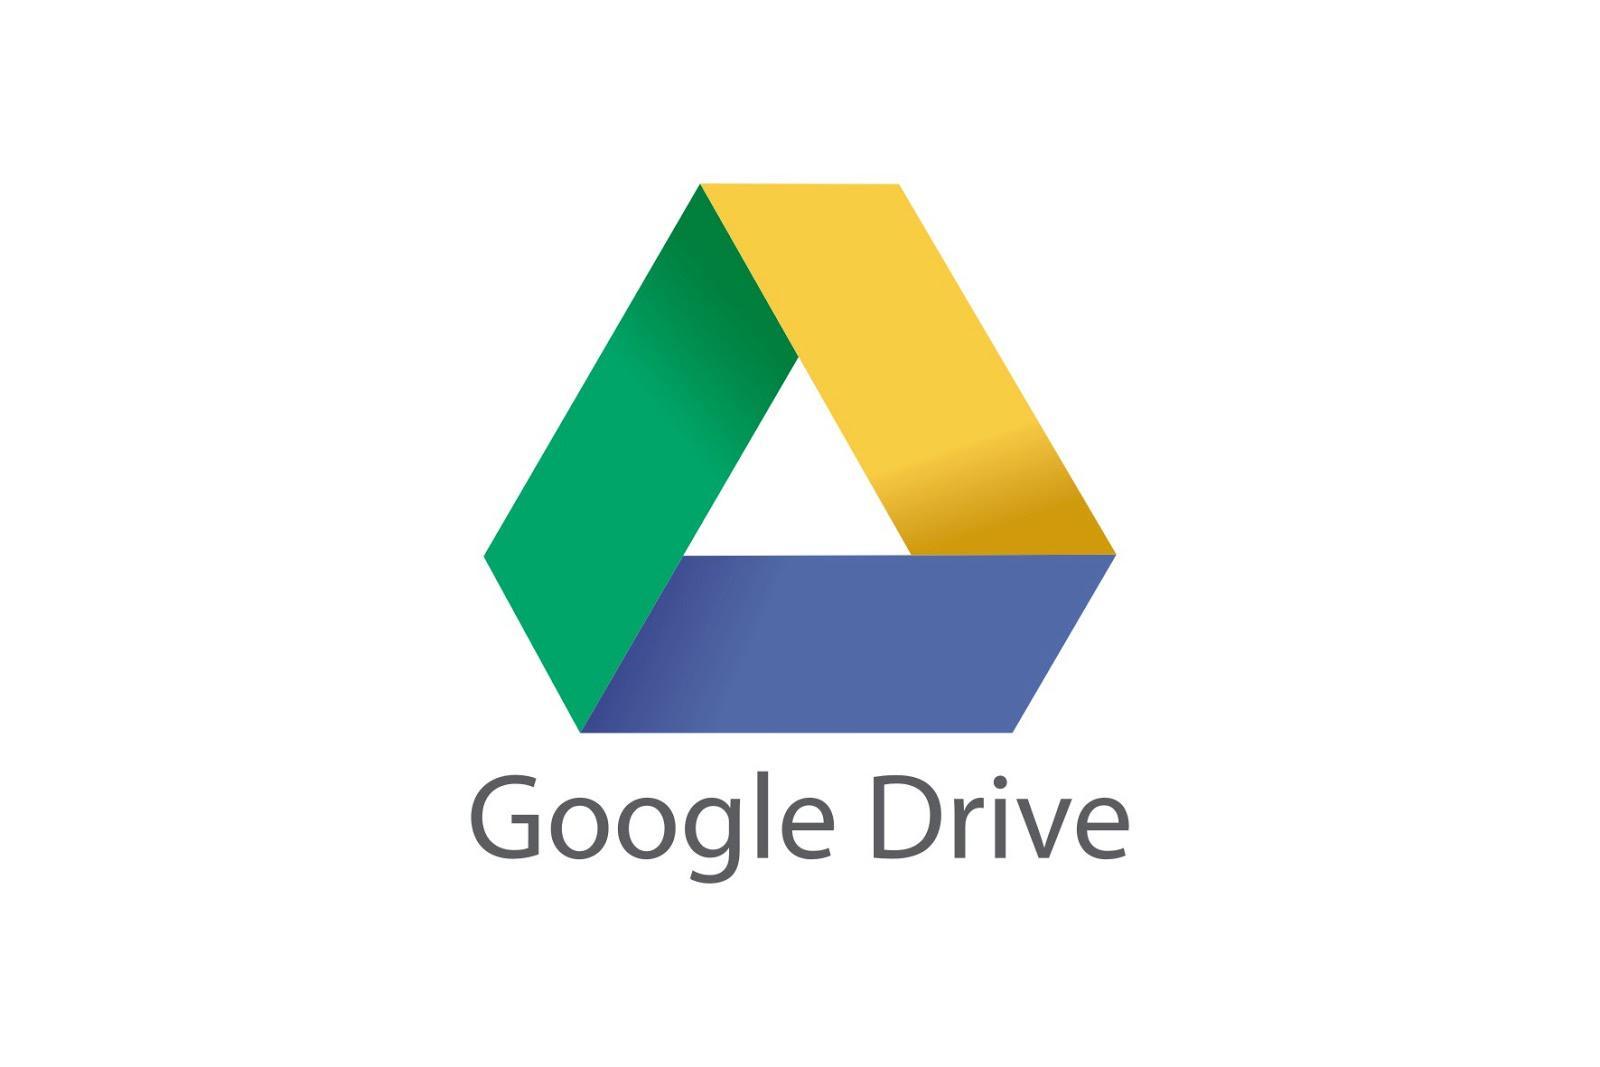 sesión 4 Google drive, Mega y la nube . 10 feb 2016